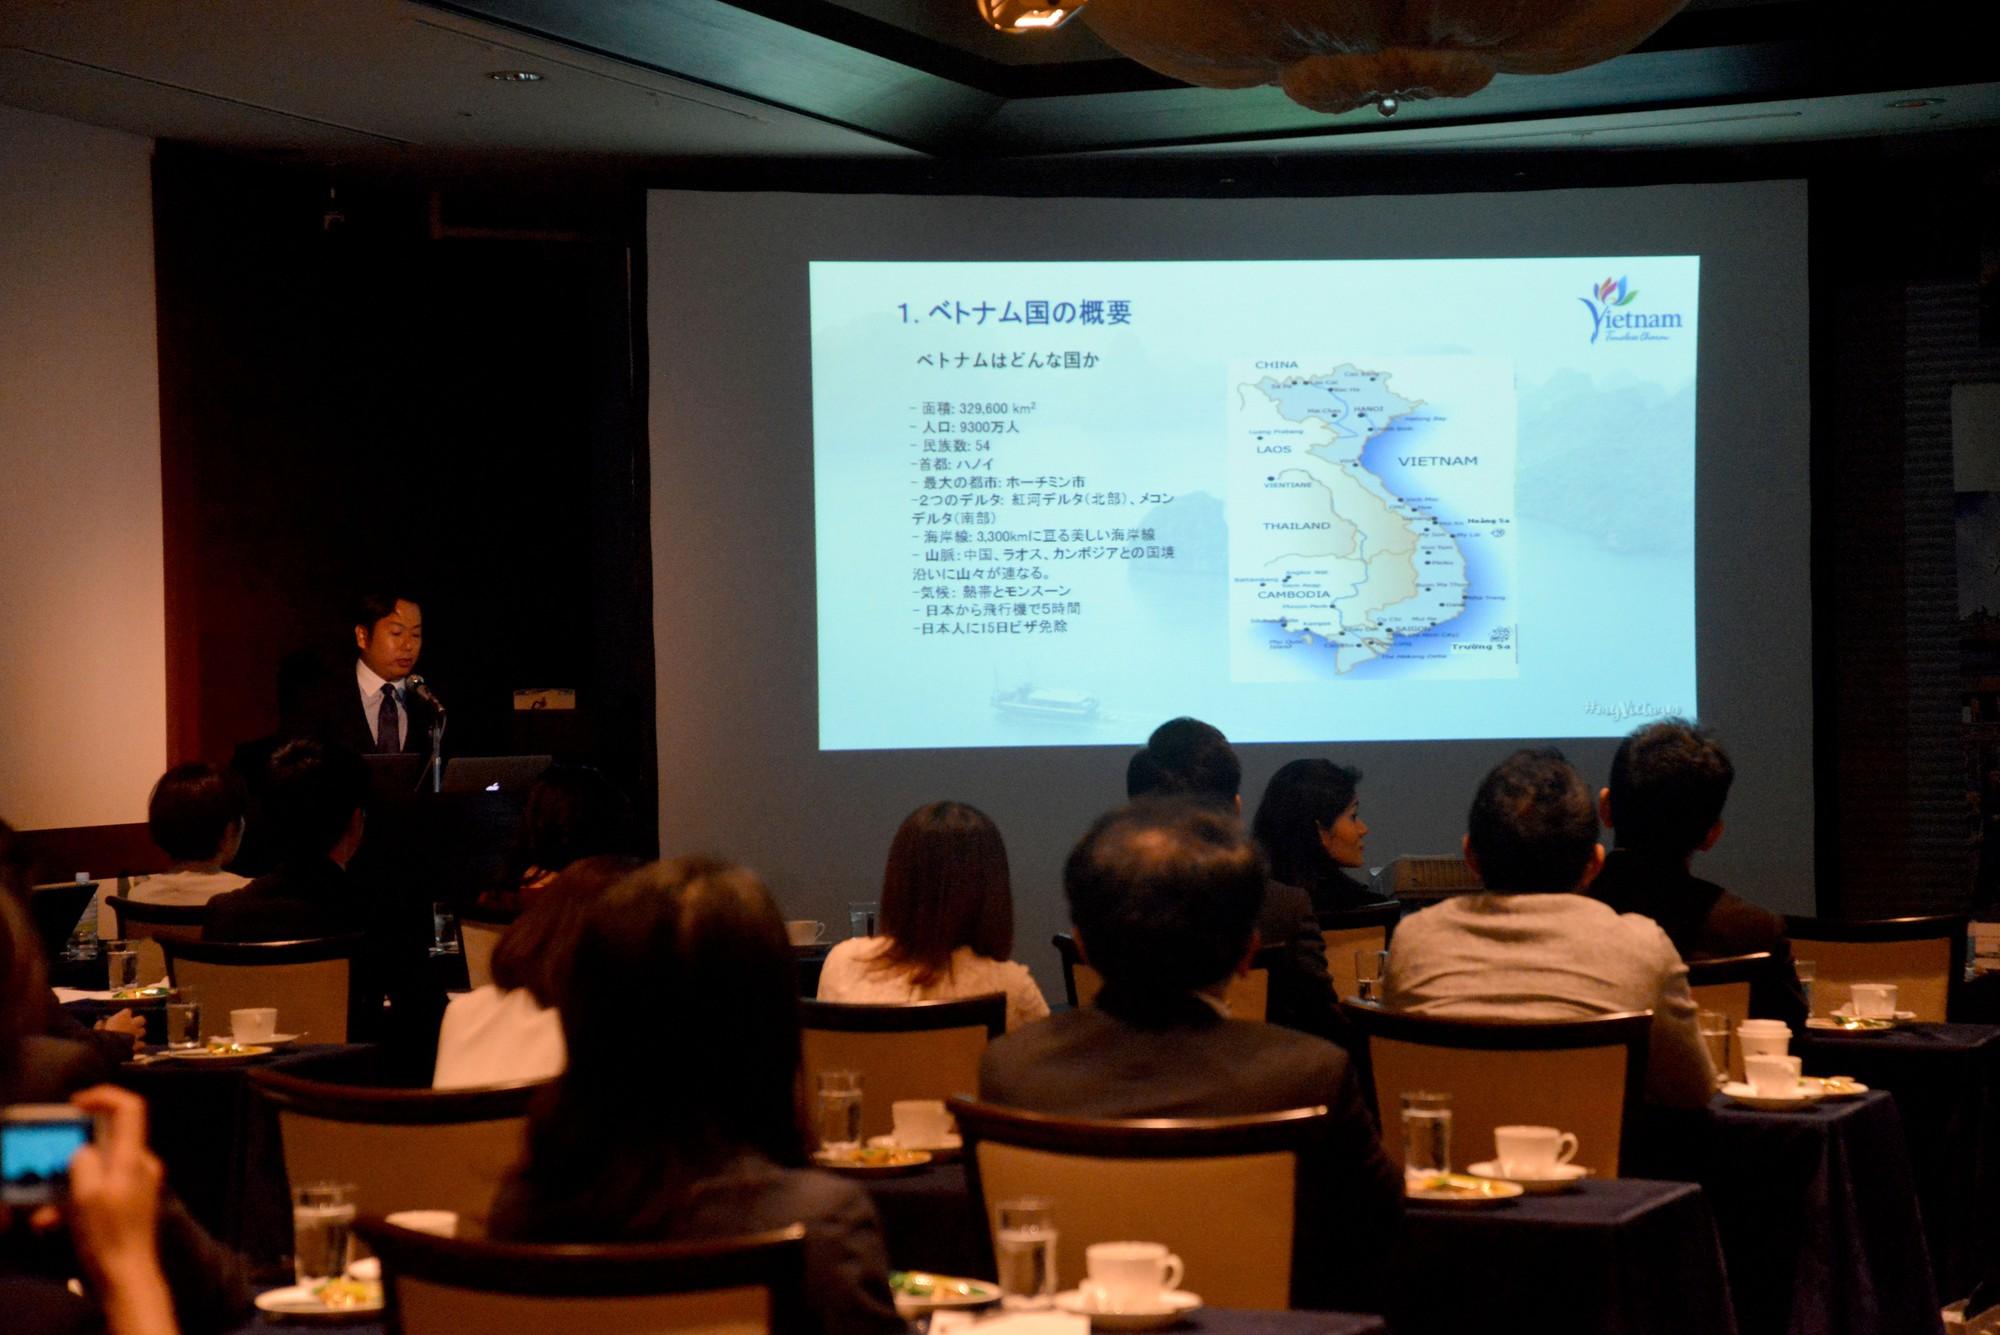 Giới thiệu Du lịch Việt Nam tại Sapporo, tỉnh Hokkaido - Ảnh 4.